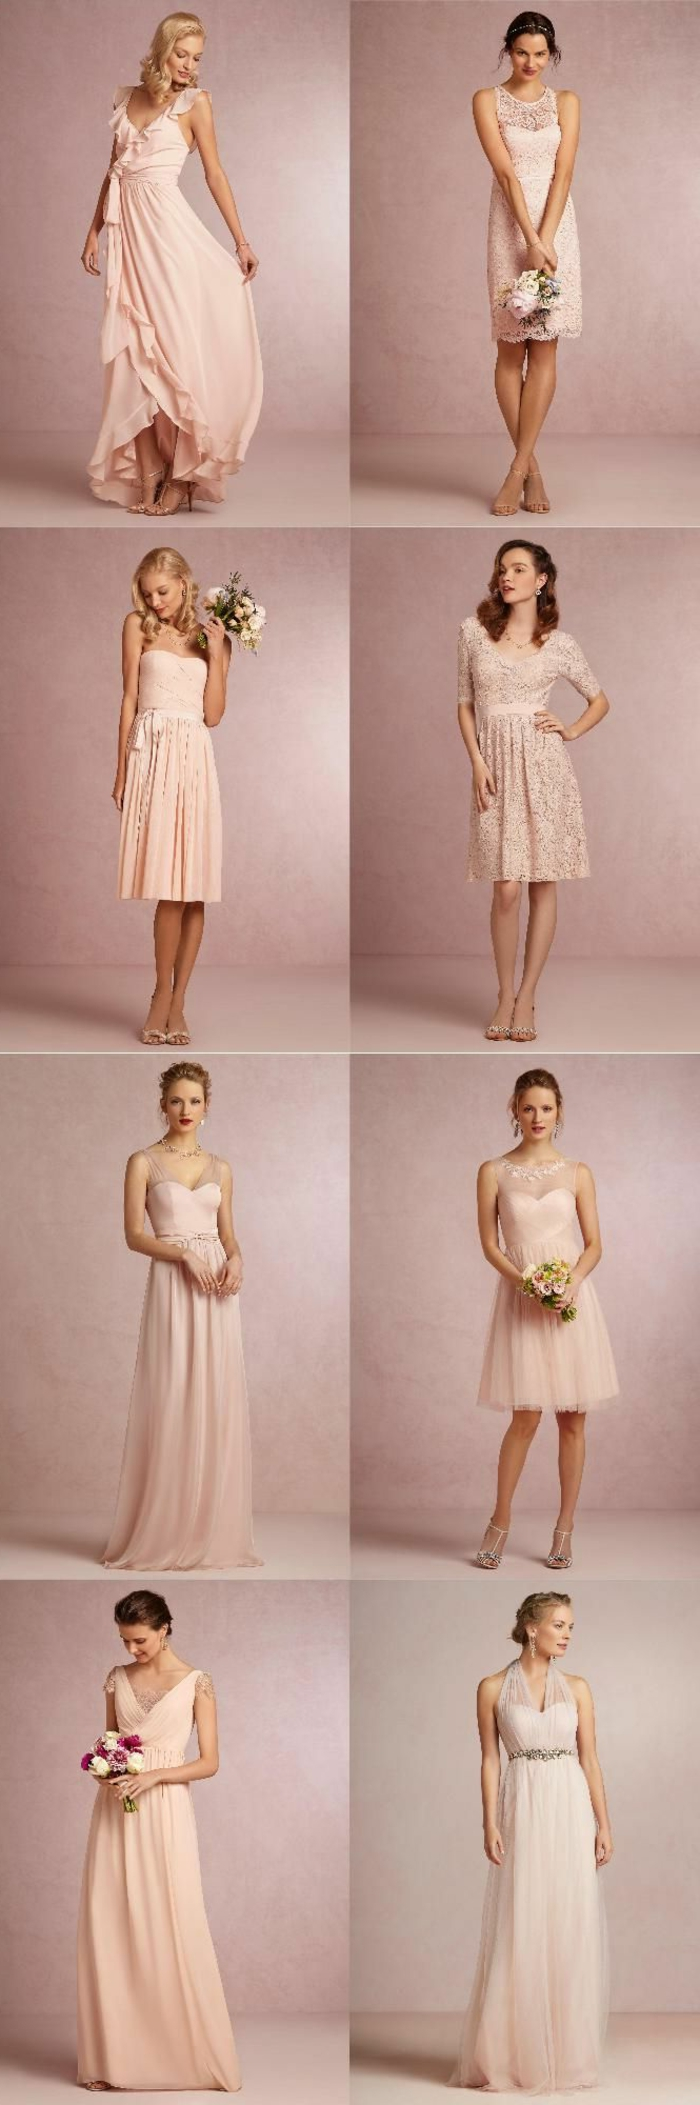 robes-demoiselles-d-honneur-femme-variants-rose-pale